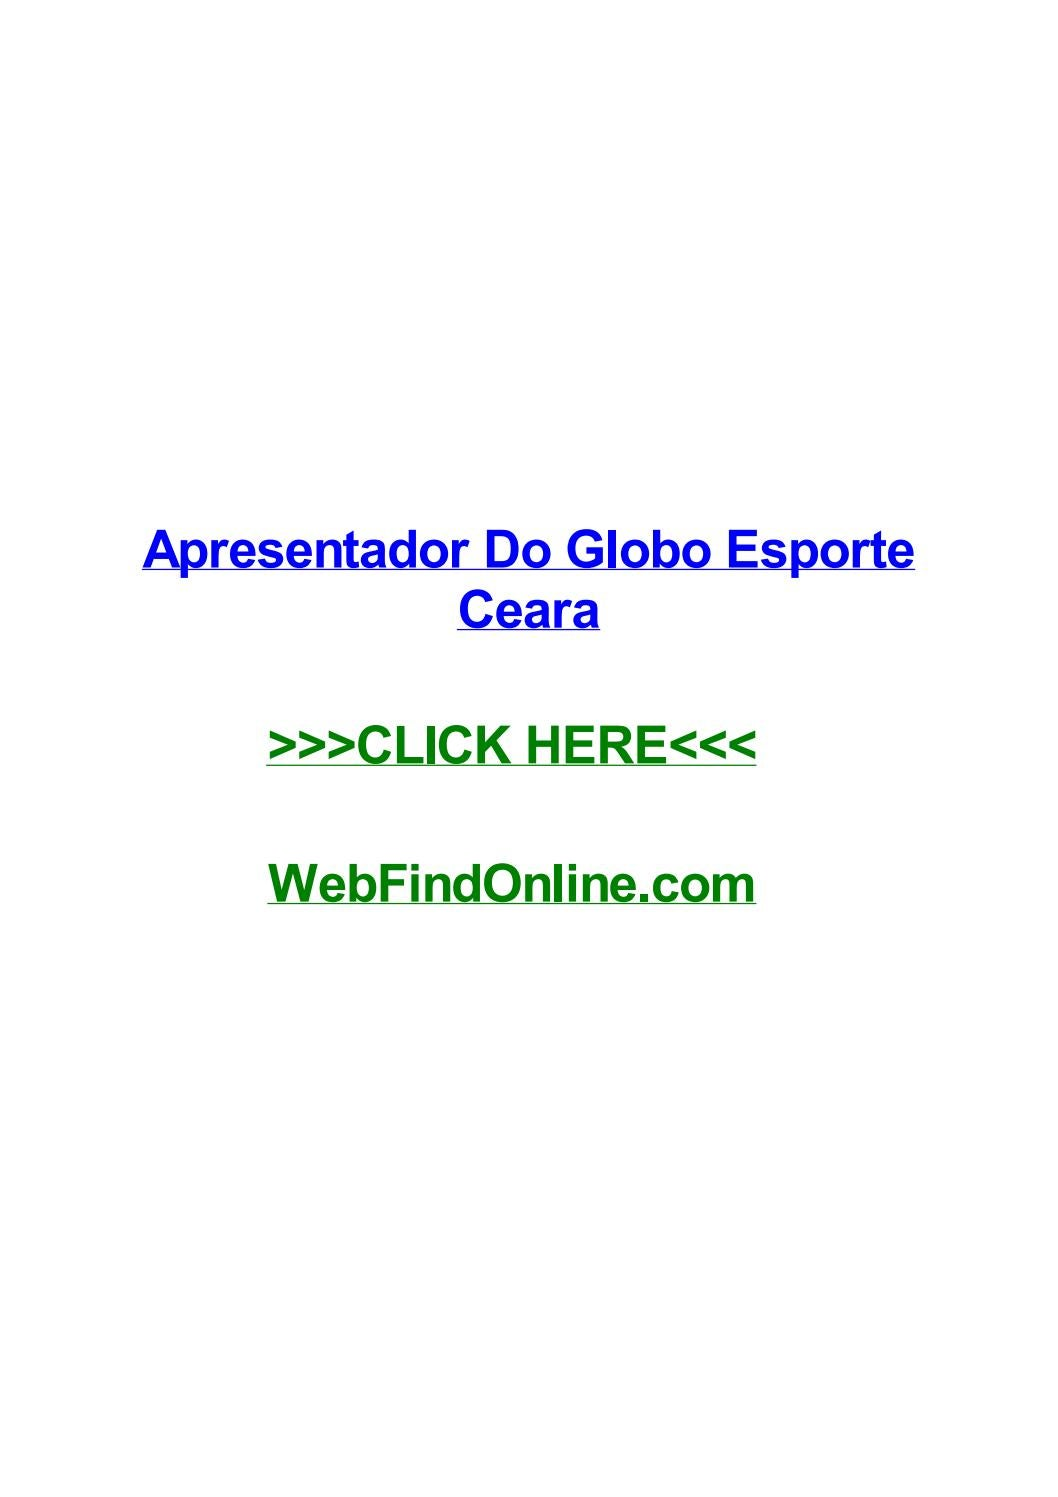 Apresentador Do Globo Esporte Ceara By Sonyabybjg Issuu